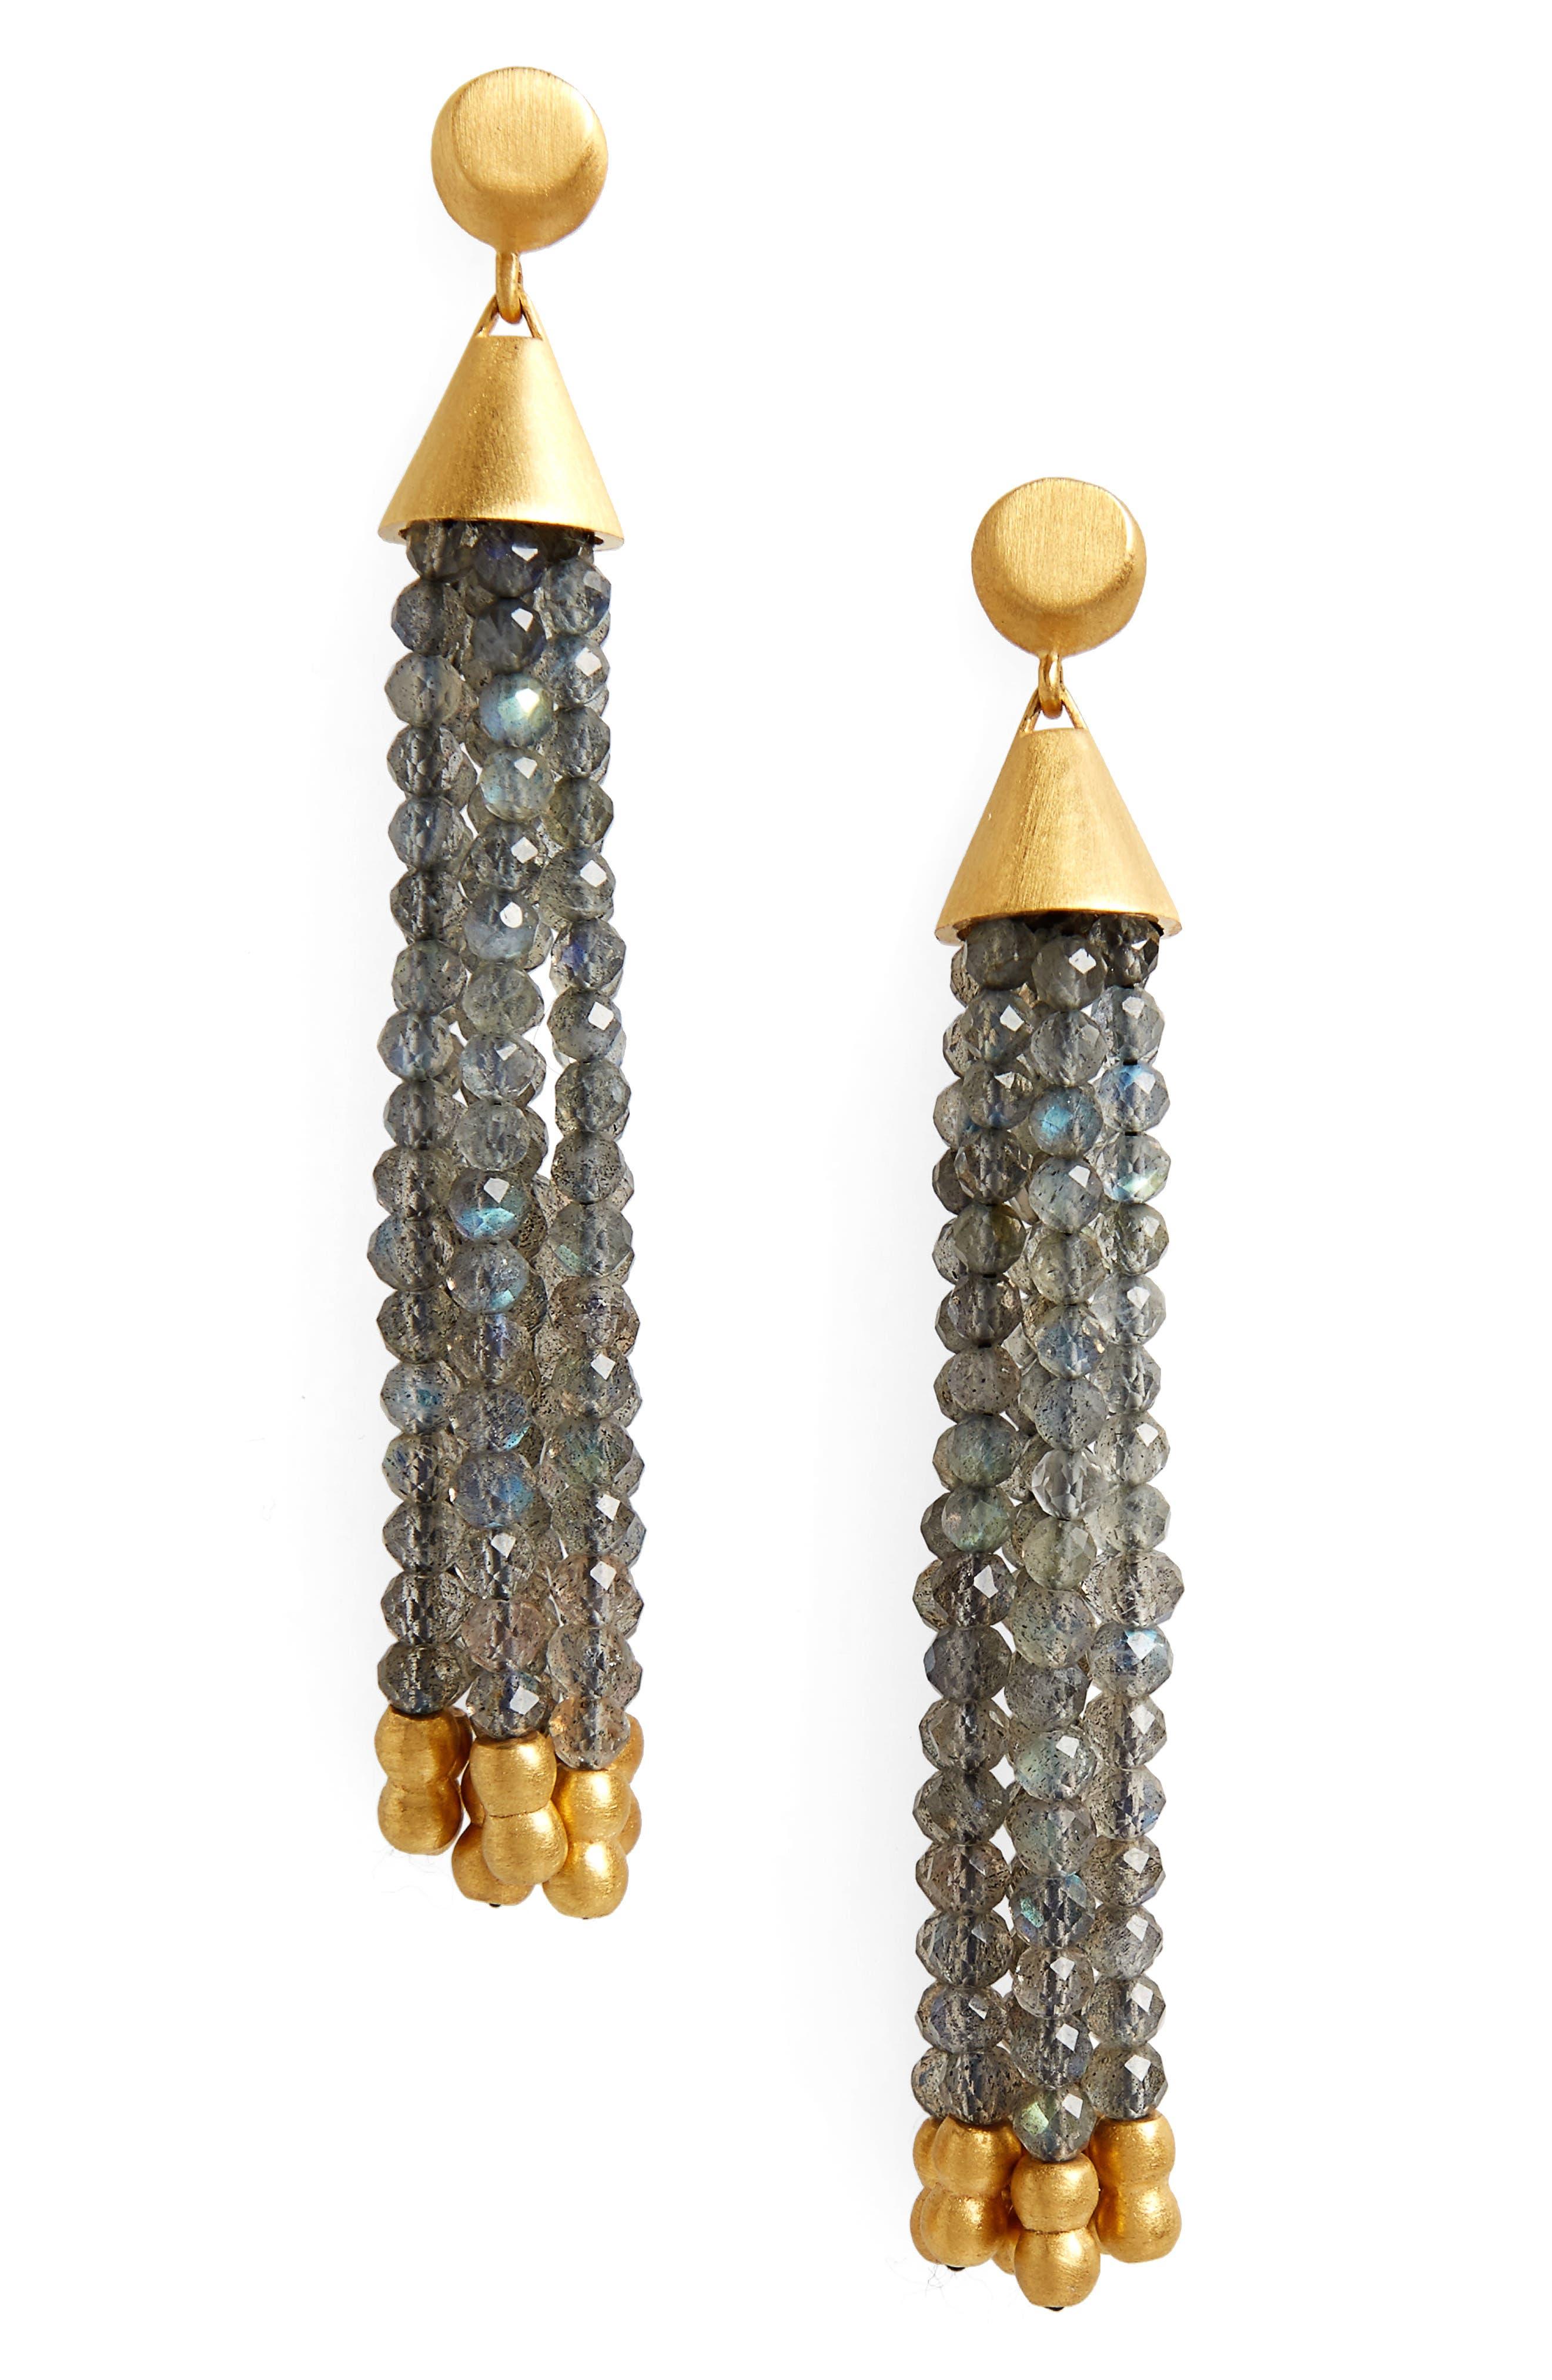 Samba Tassel Earrings,                             Main thumbnail 1, color,                             Labradorite/ Gold